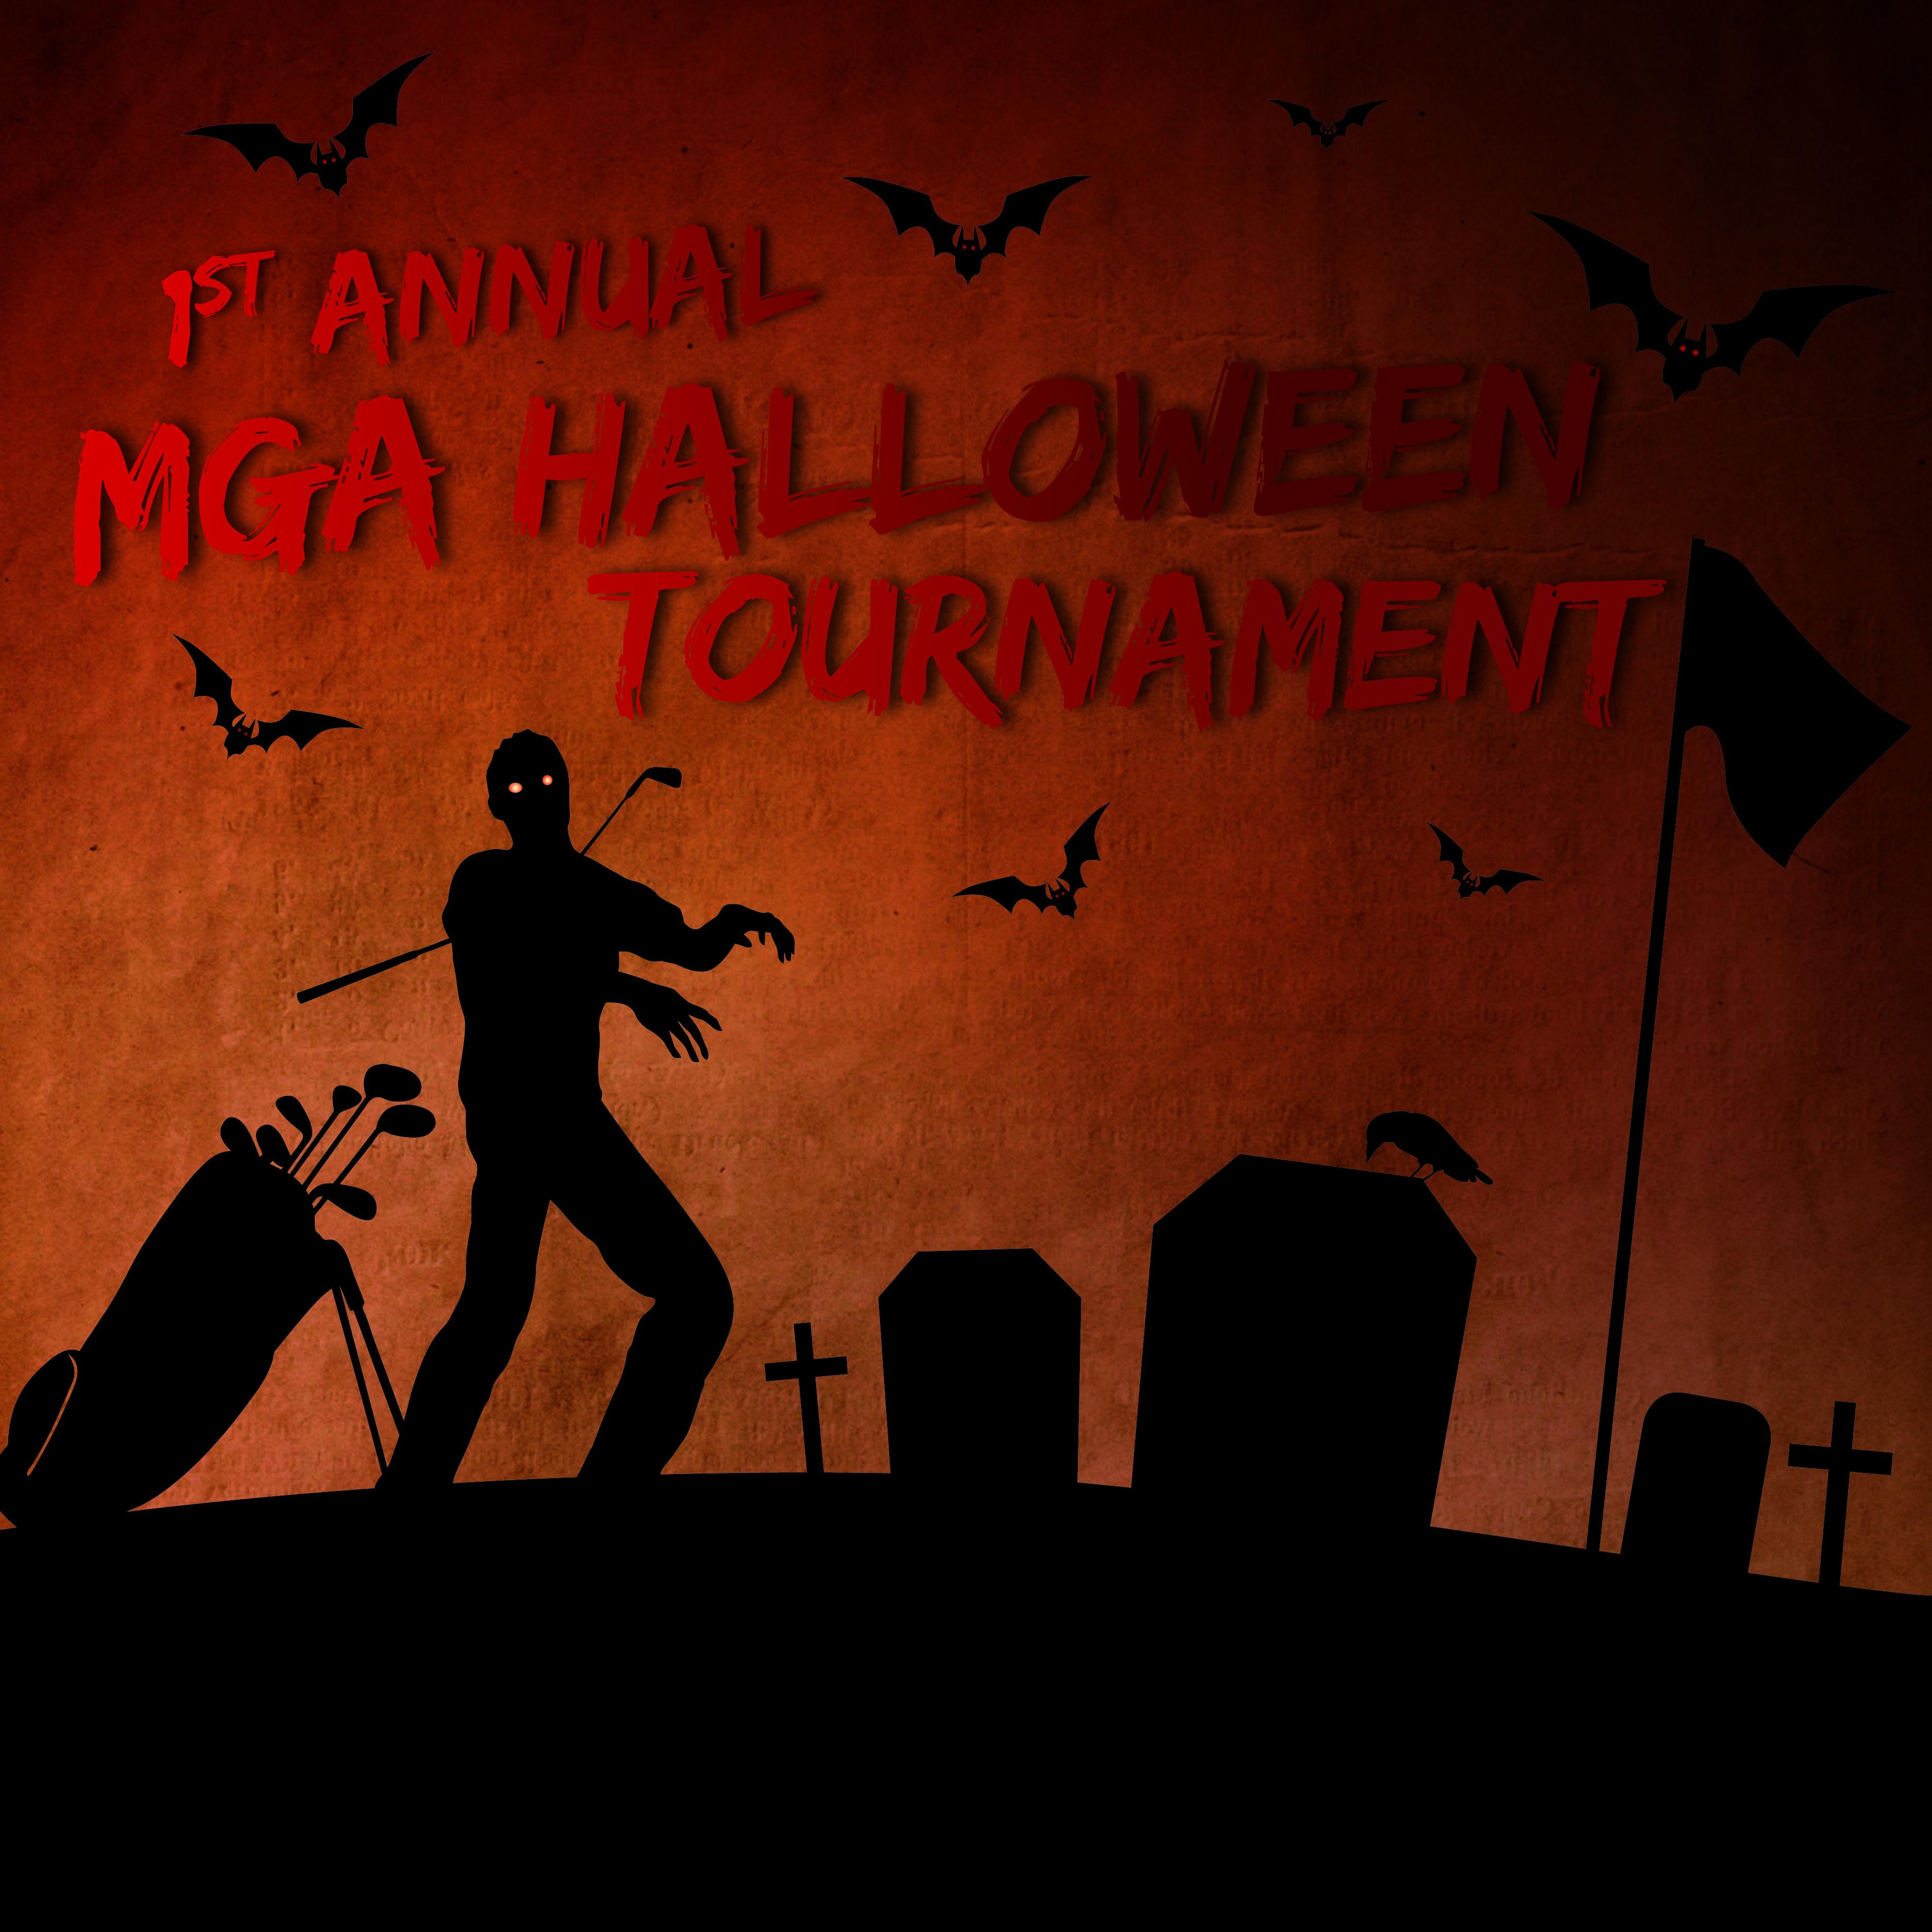 1st Annual MGA Halloween Tournament at Sun N Lake Golf Club in Sebring, FL